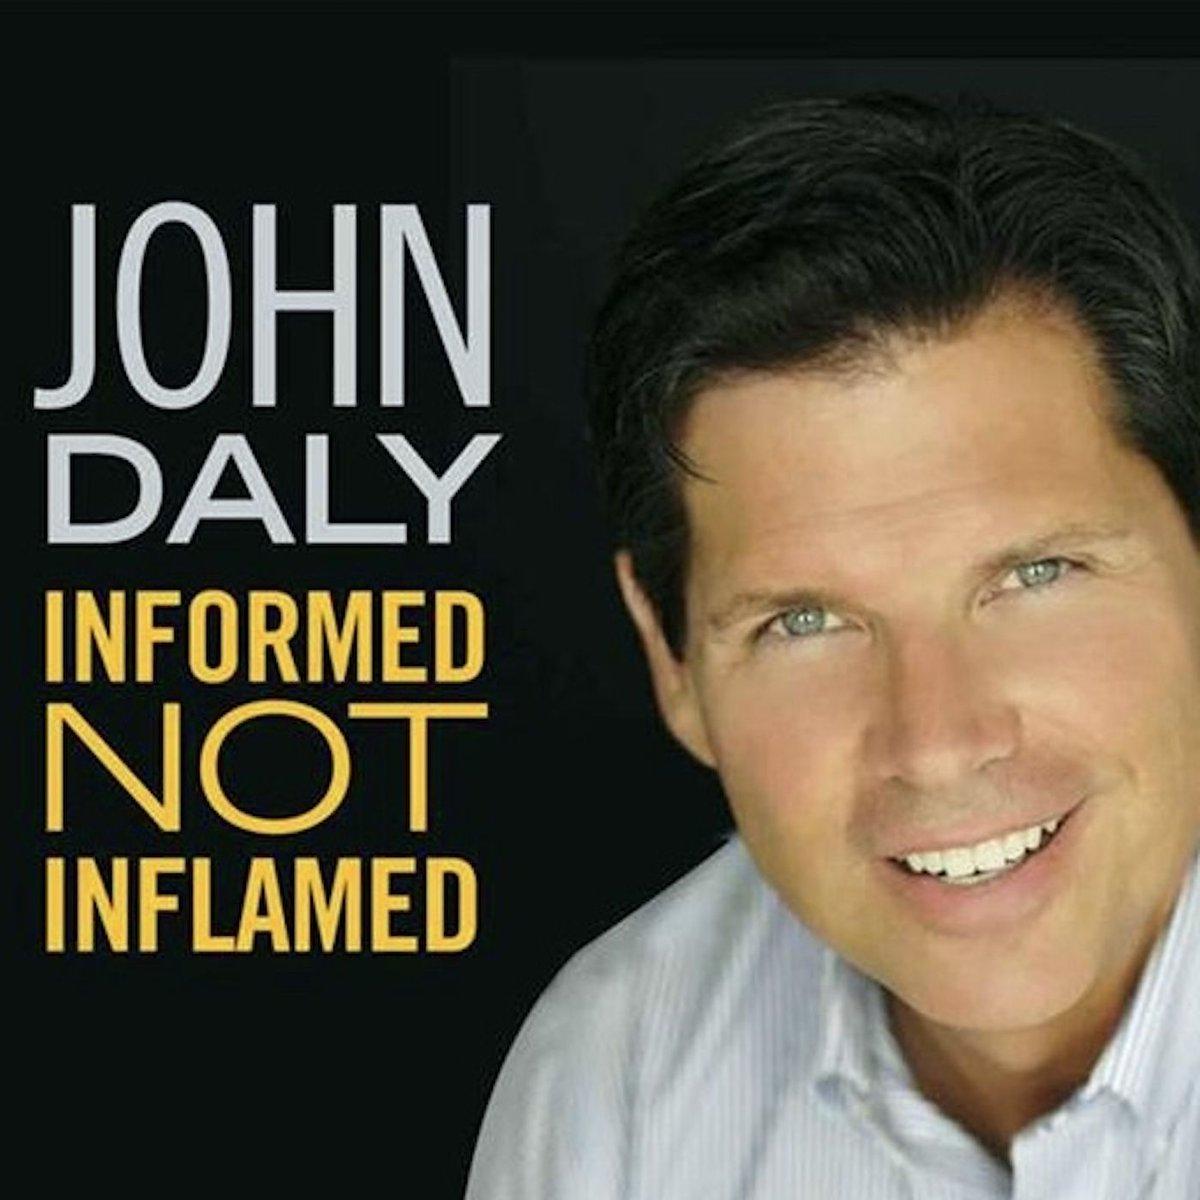 Get informed quickly.  Watch these videos. https://buff.ly/32QOhbn #mediabias #NoBSGuide #JohnDaly #NoFakeNews #BelieveinJournalism #realNews #facts